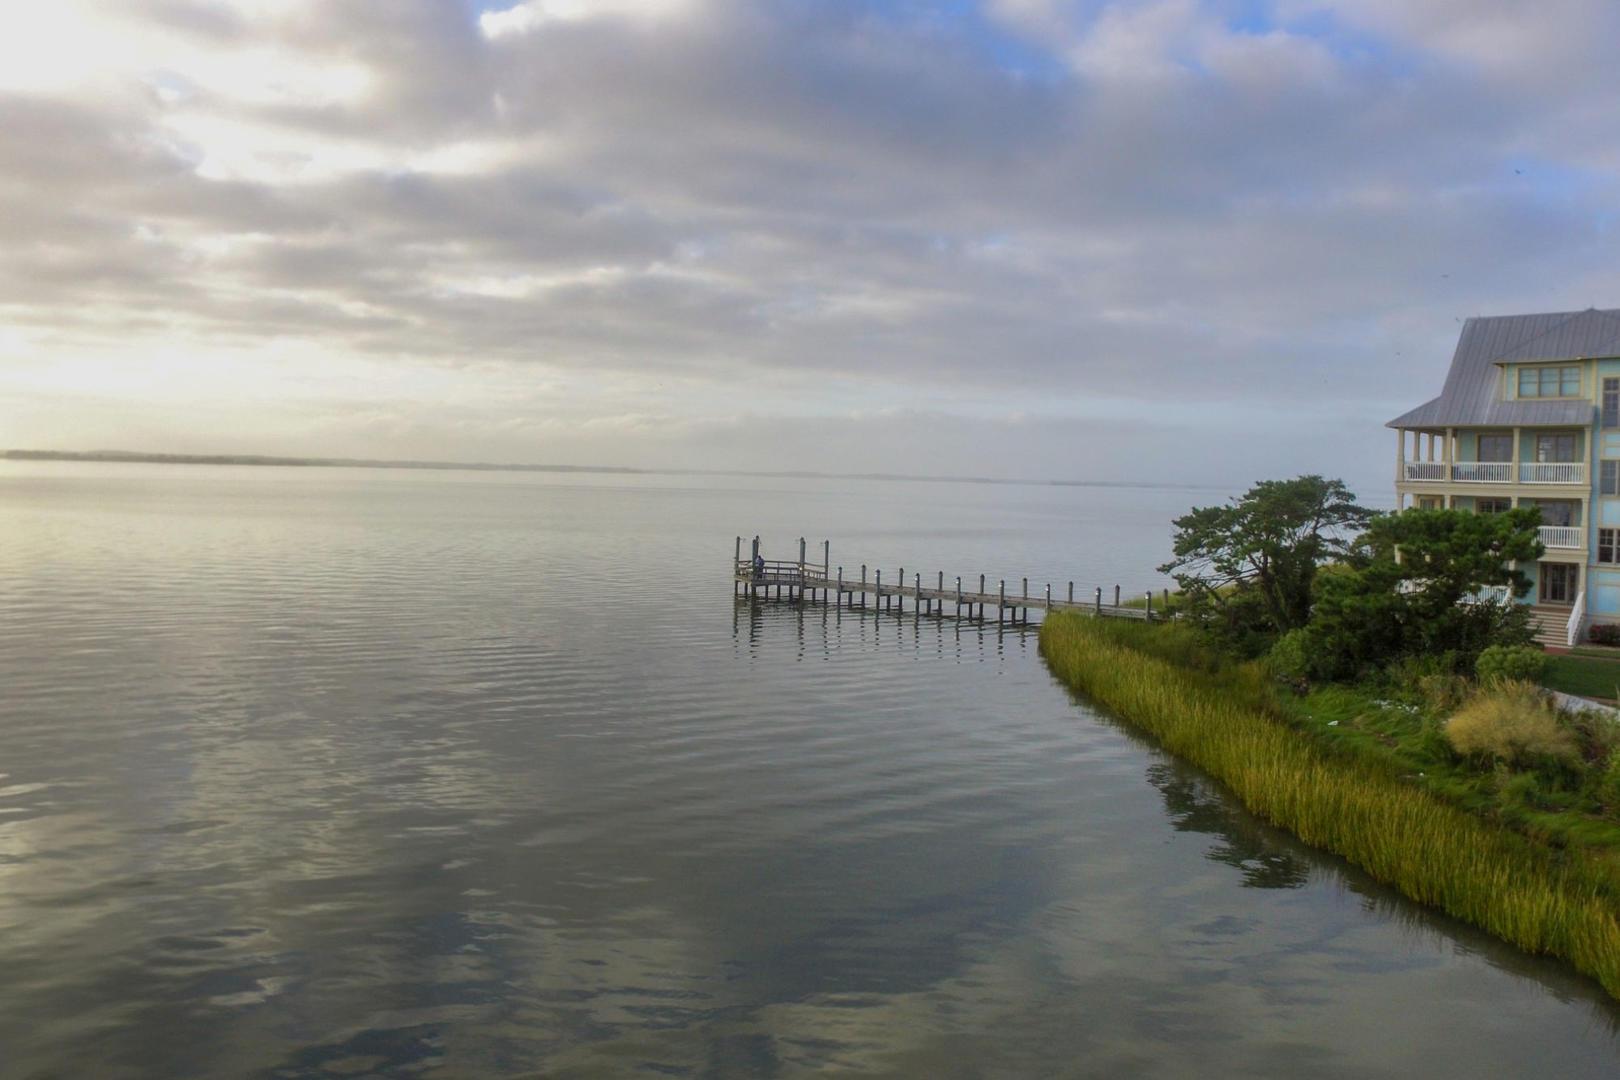 Sunset Island-Fishing and Crabbing Pier